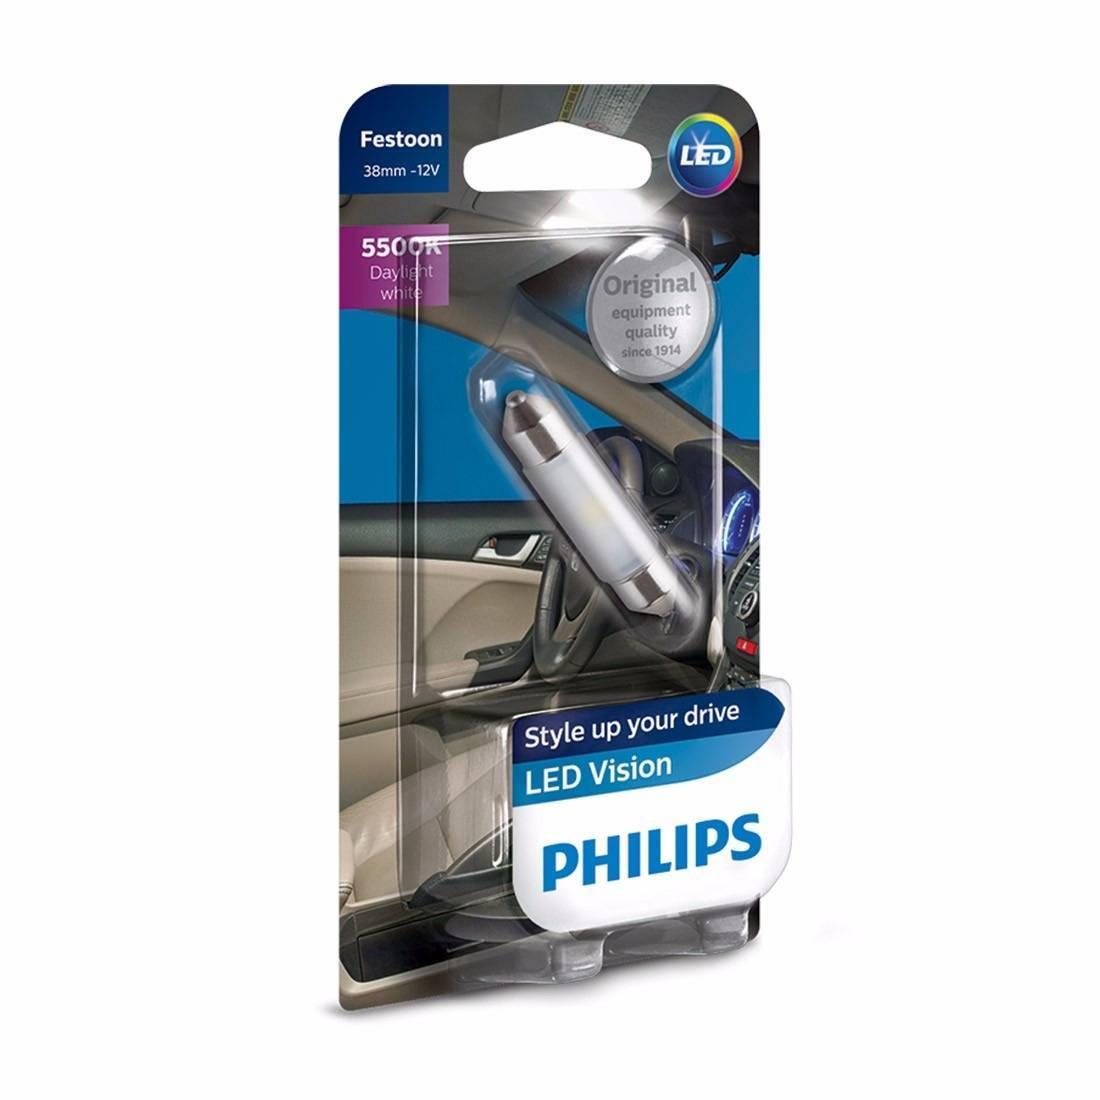 LED Automotivo Philips Festoon 38mm 10w 12v - Torpedinho - Loja FullPower